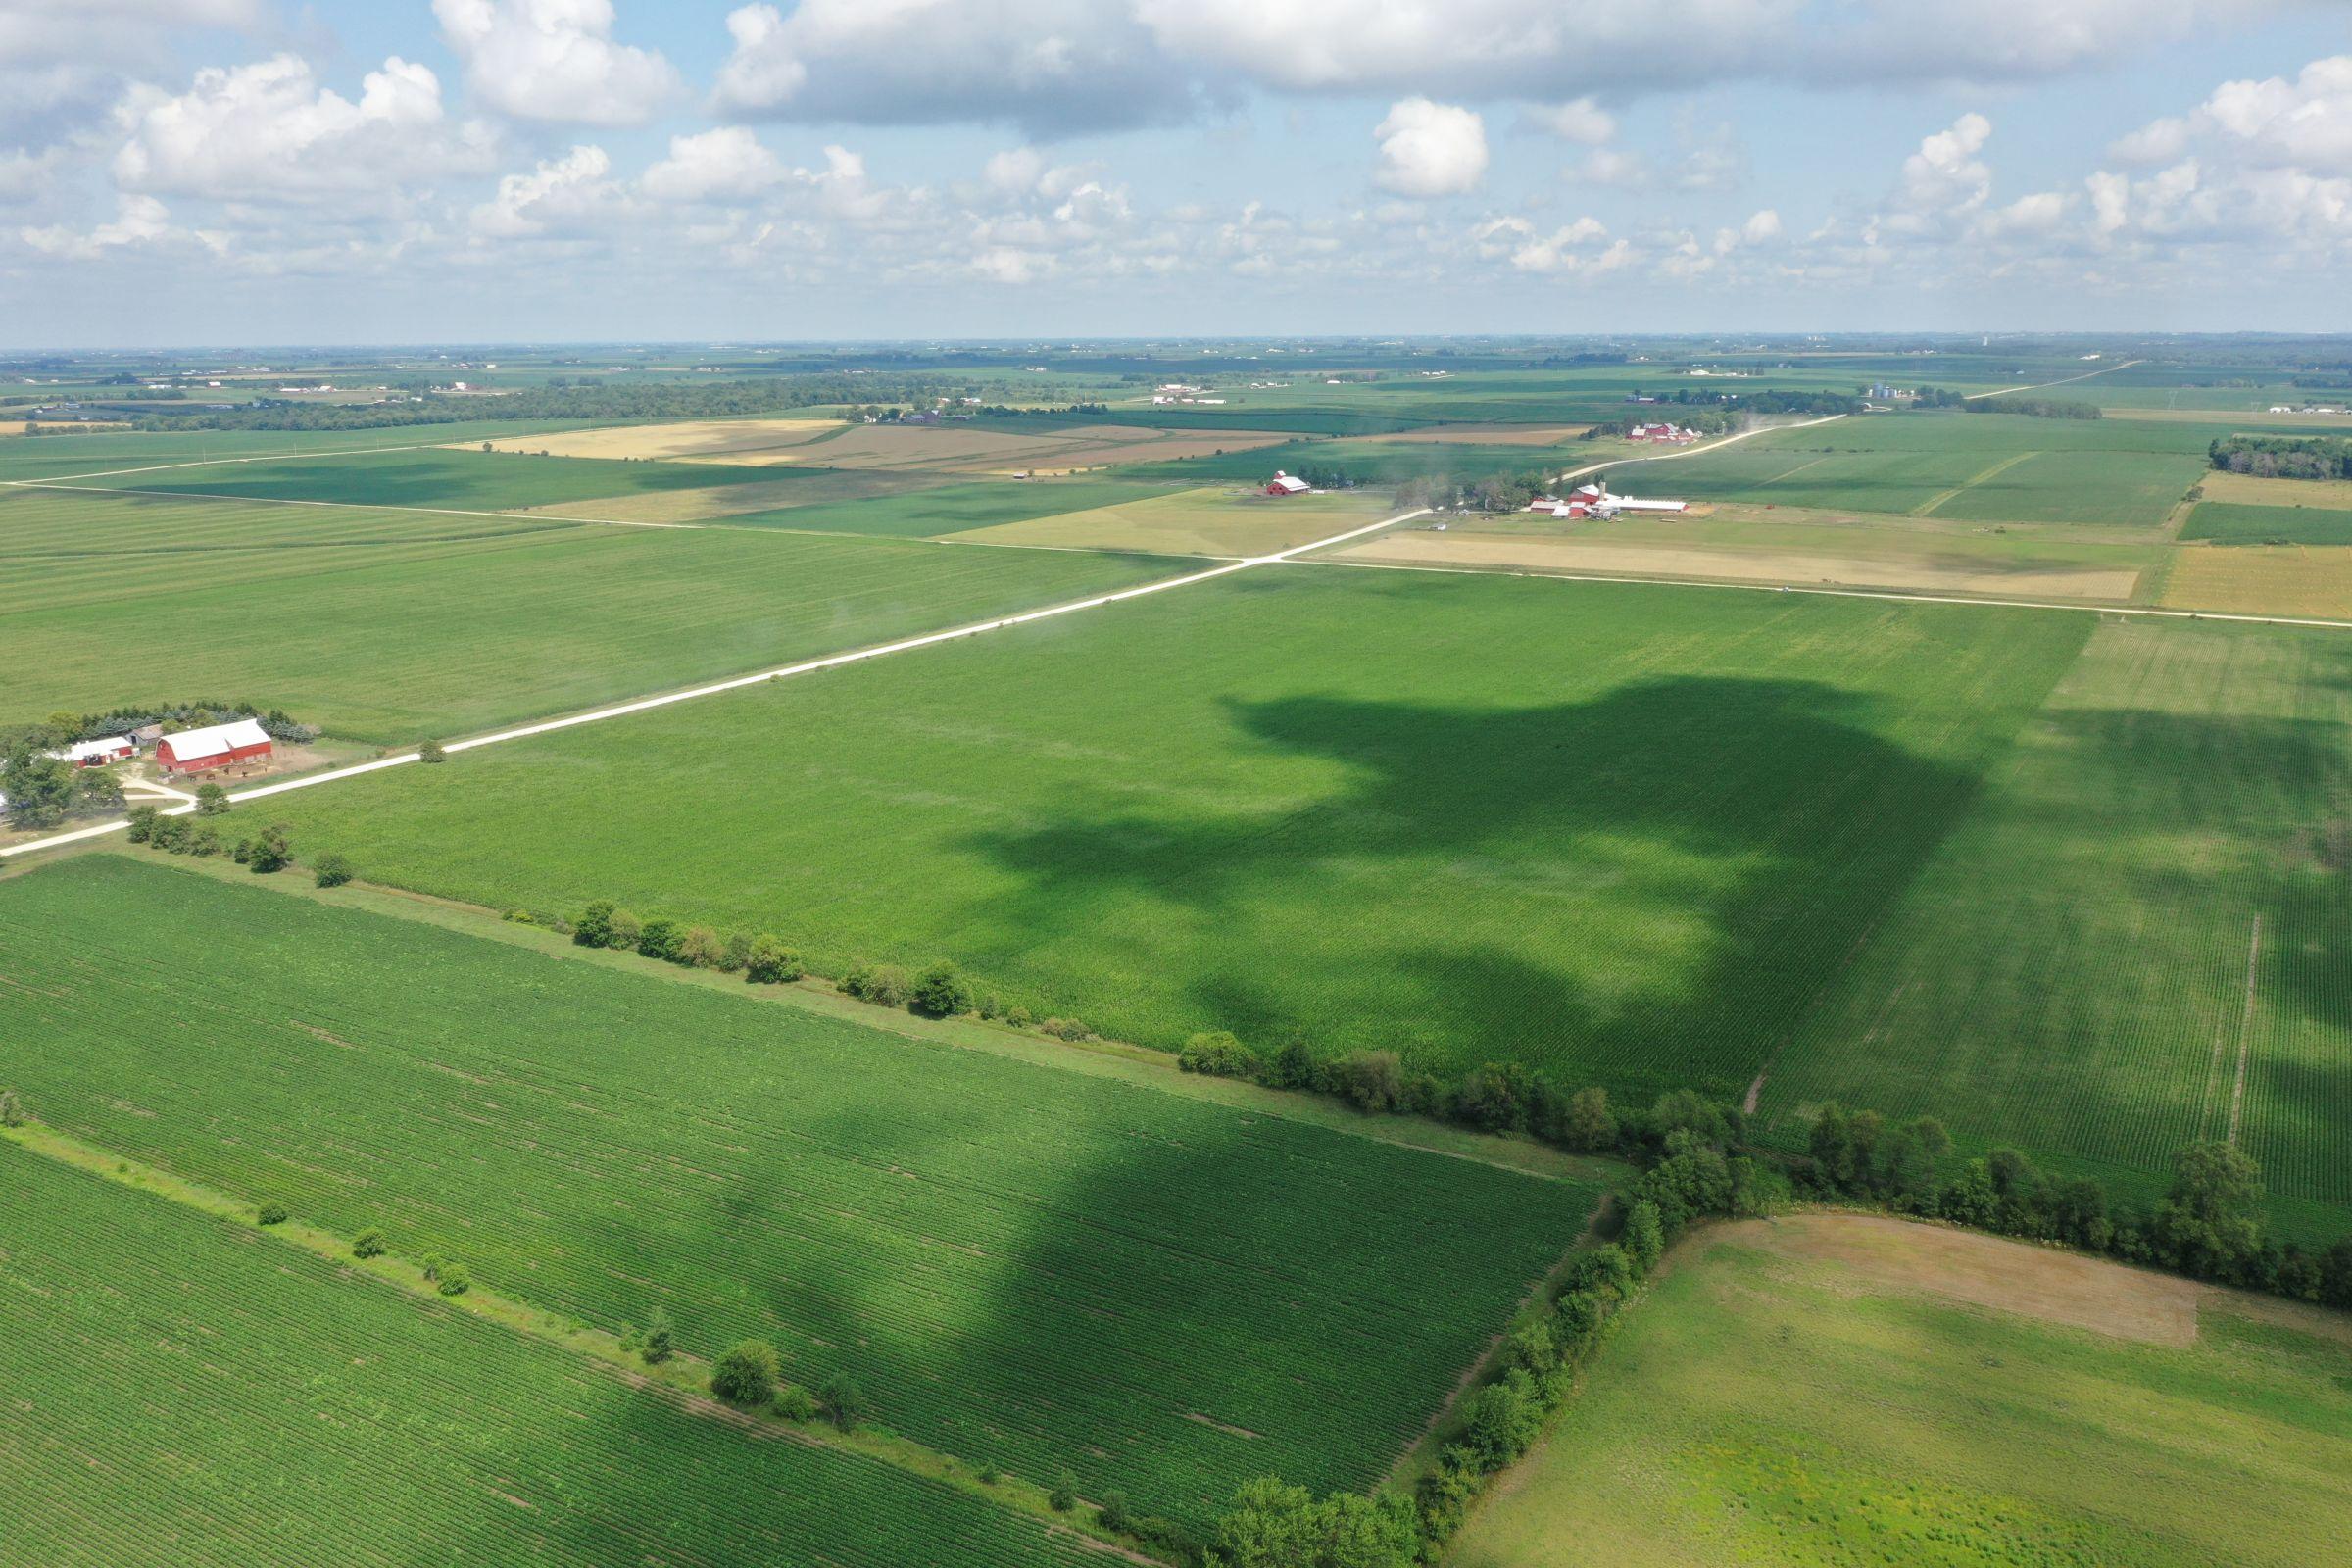 land-buchanan-county-iowa-60-acres-listing-number-15640-2-2021-07-15-183930.JPG